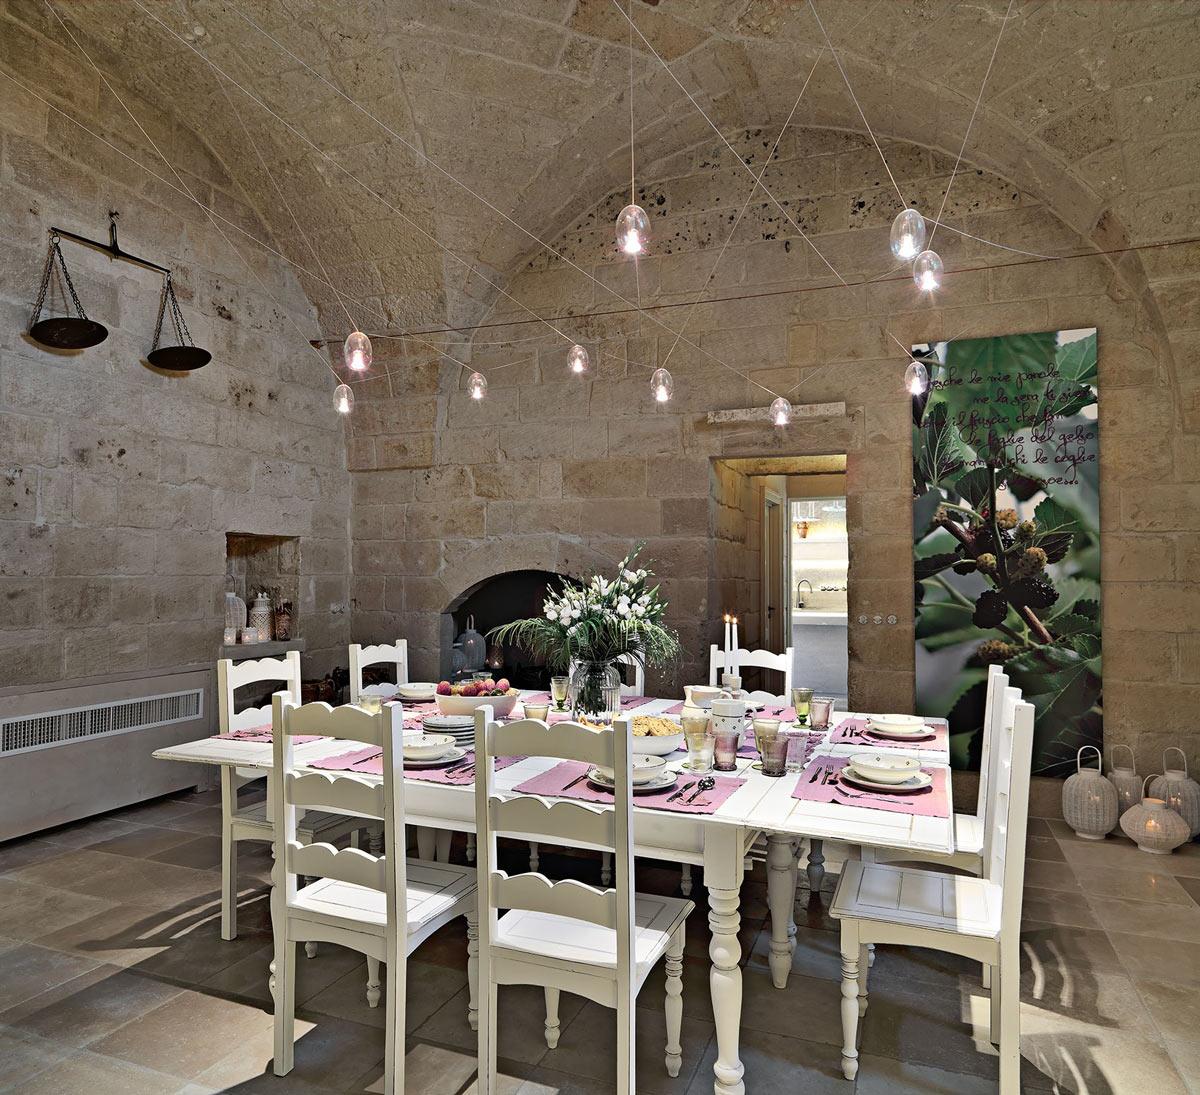 Dining Room, Lighting, Art, Relais Masseria Capasa Hotel in Martano, Italy